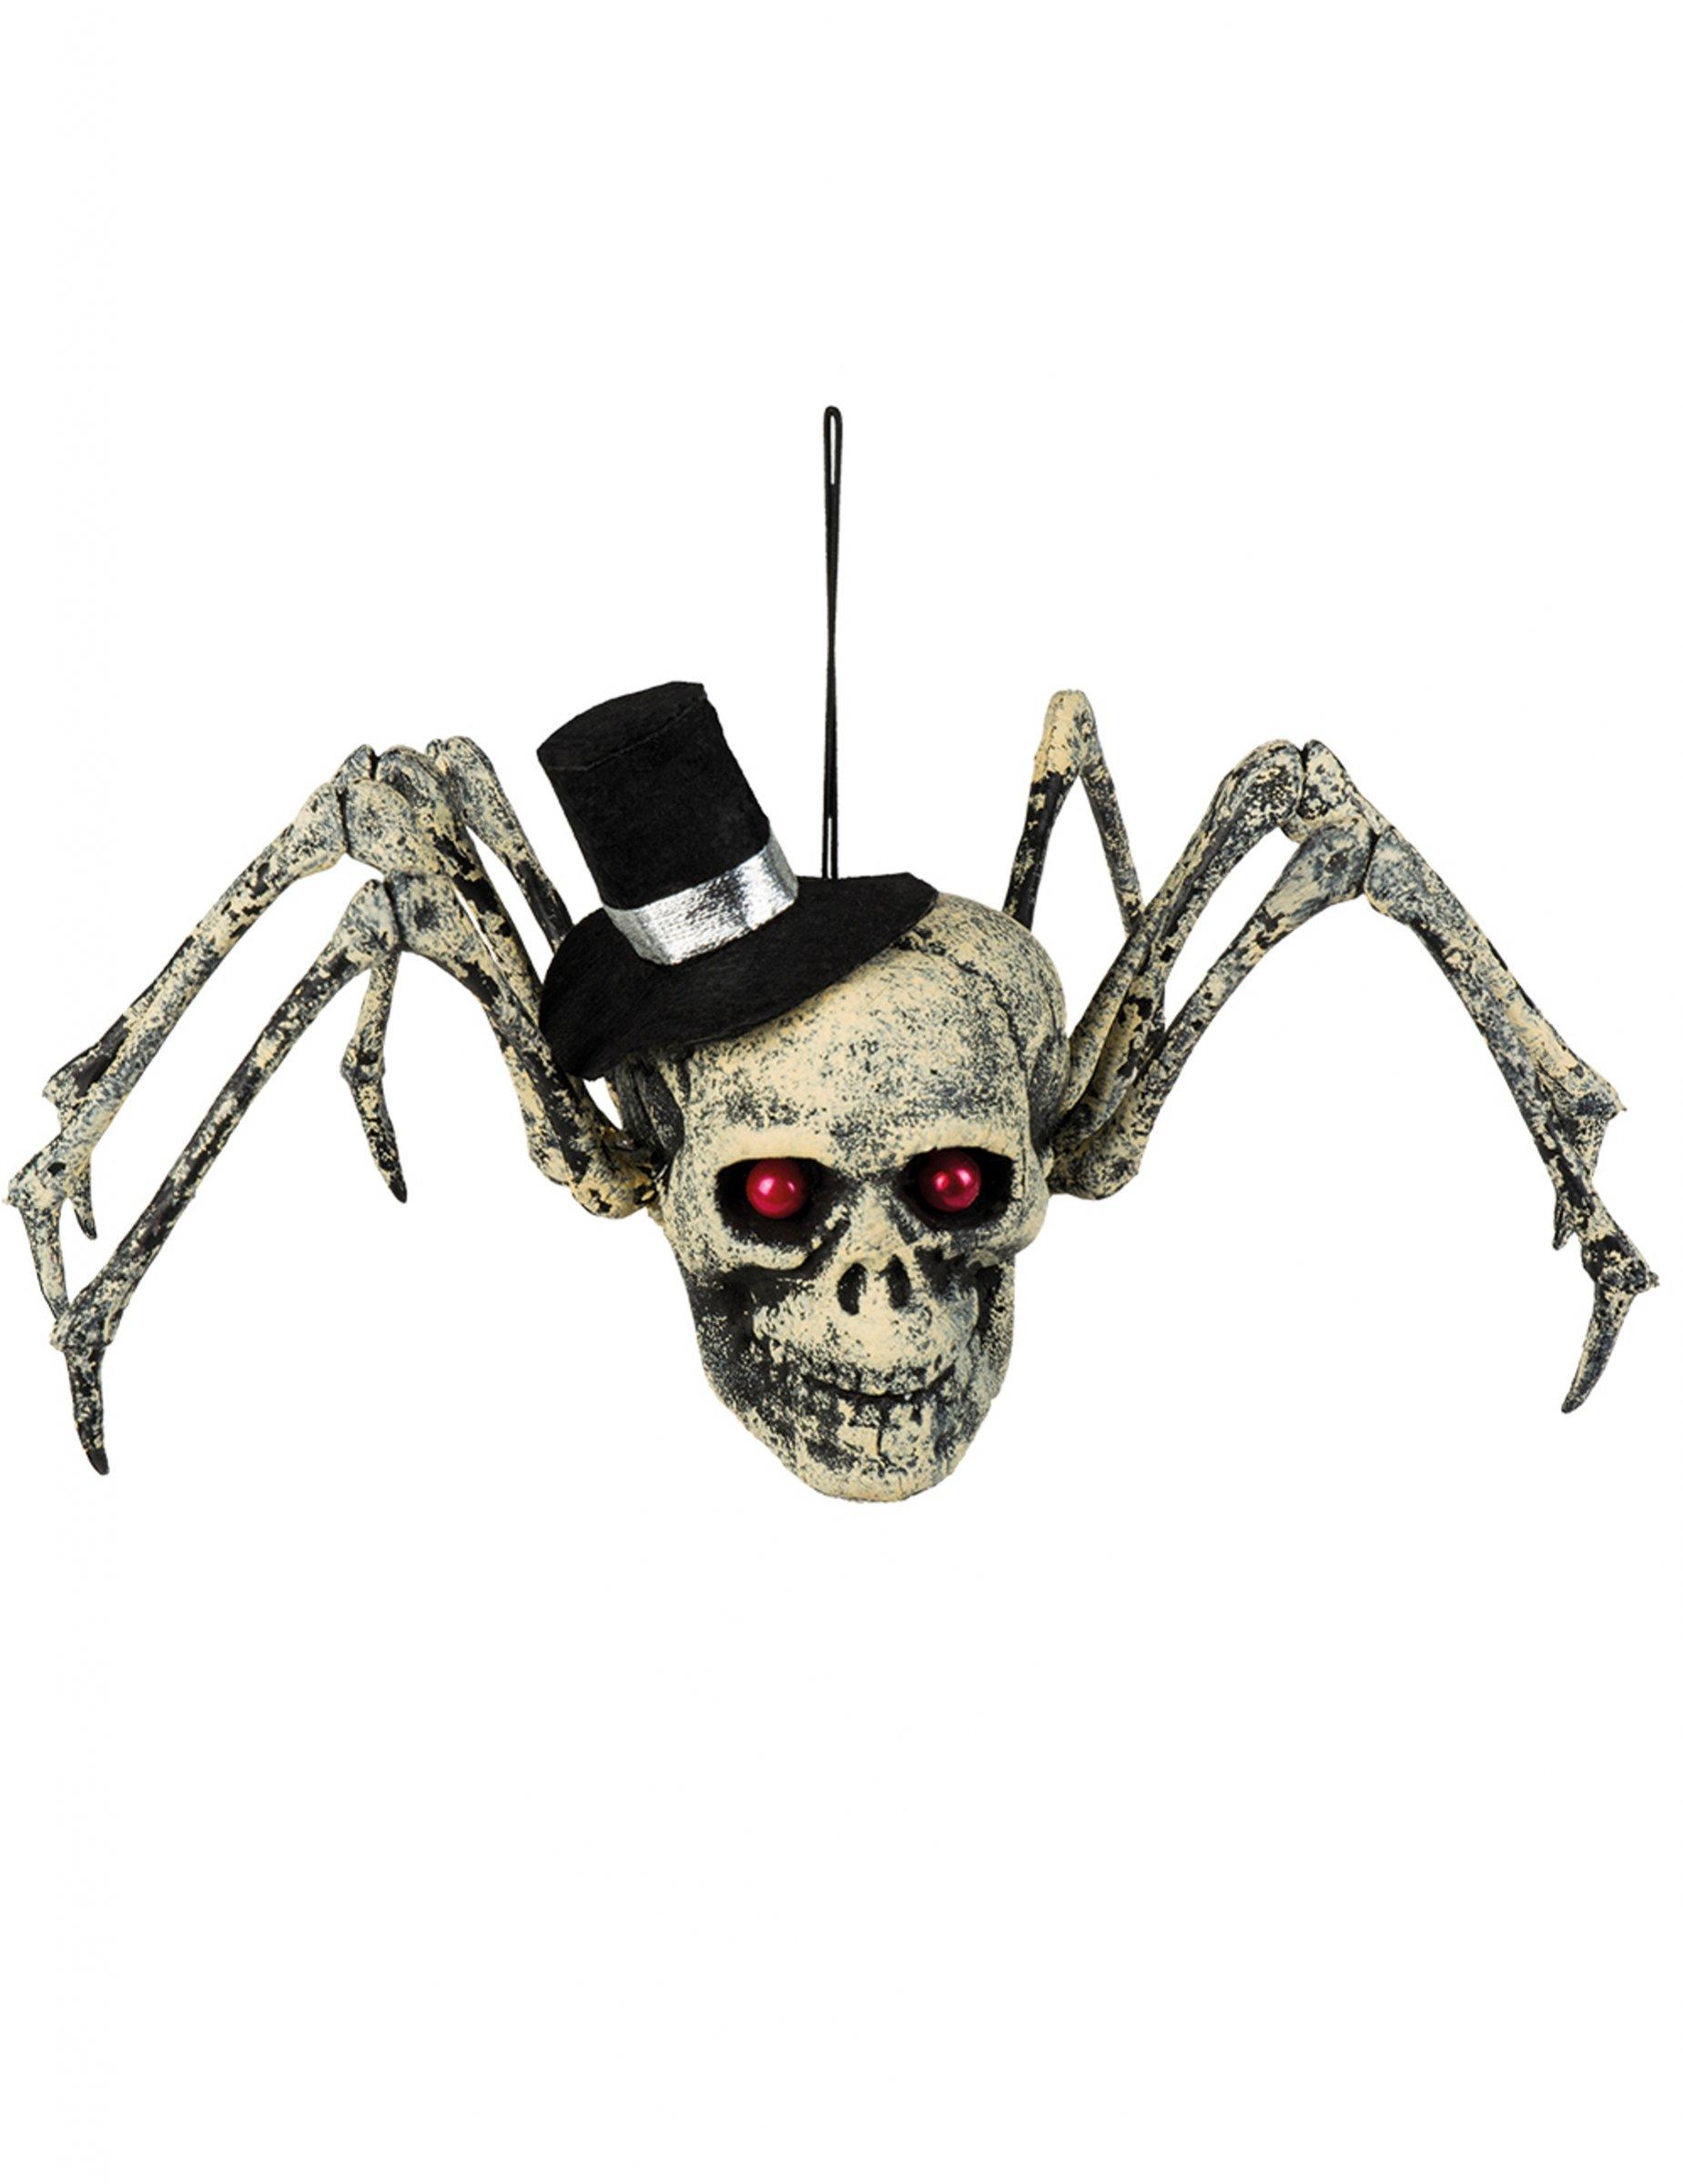 Image Araignée Halloween décoration squelette araignée halloween 23 x 30 cm : deguise-toi